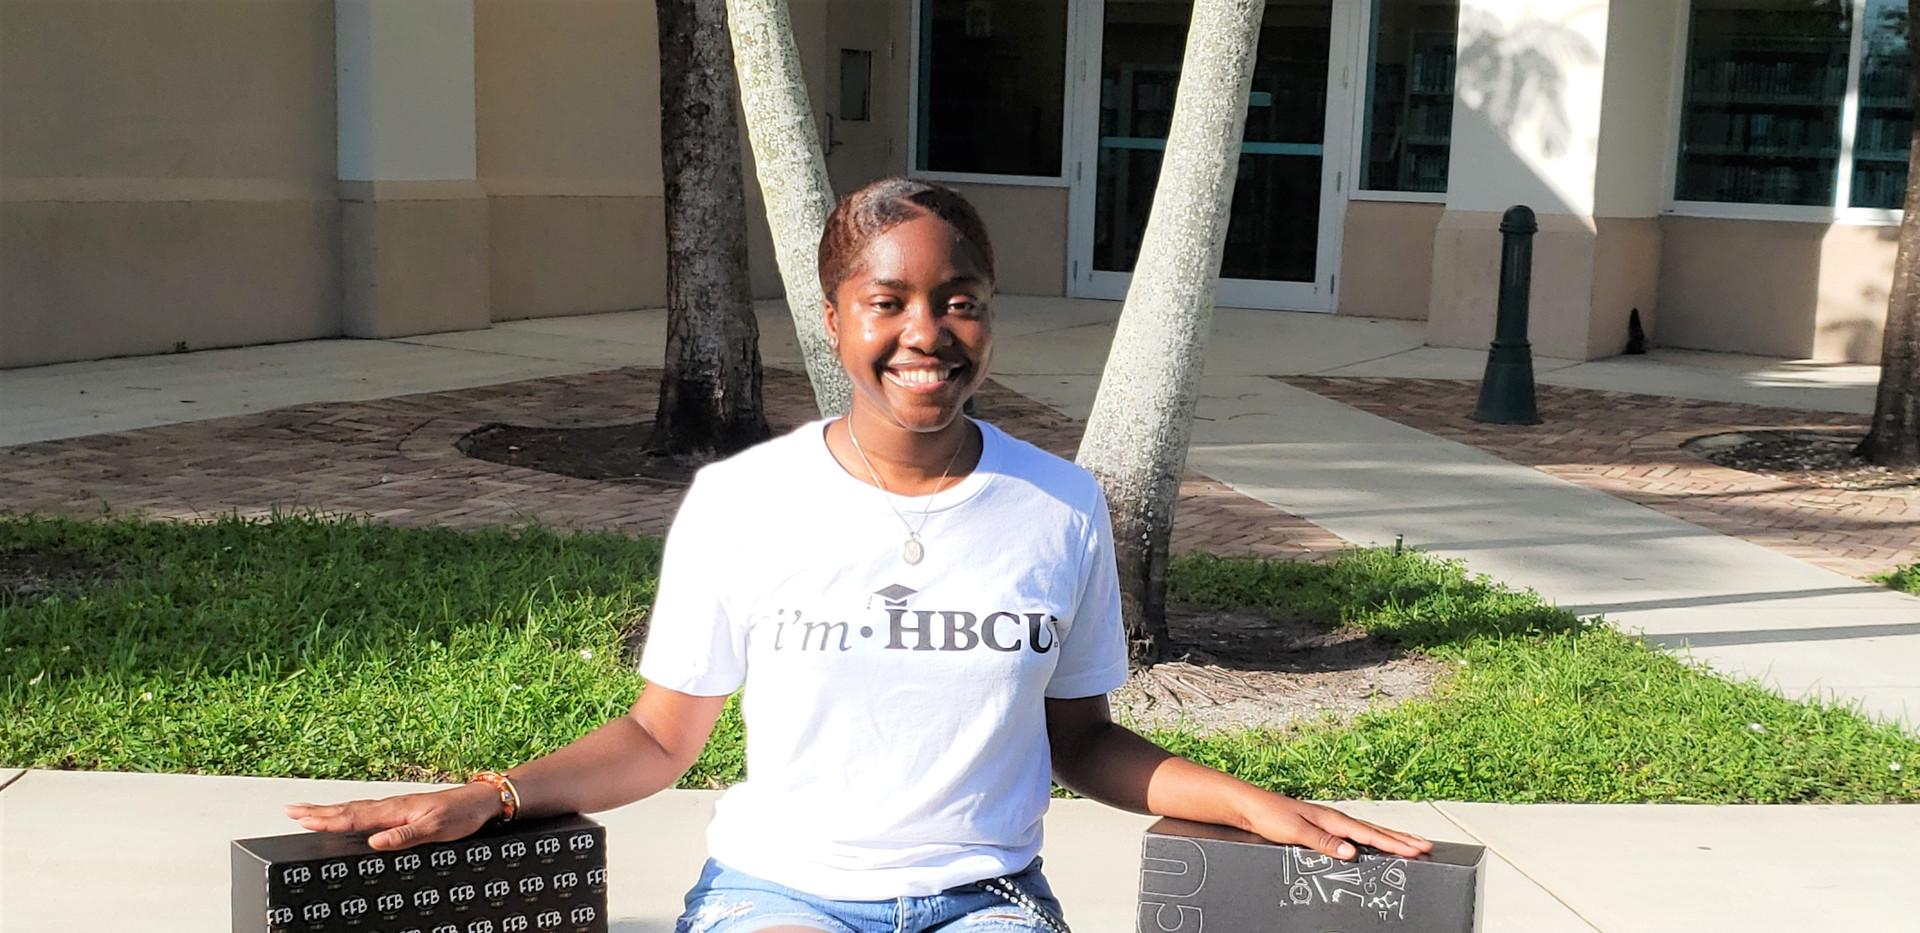 The HBCU Box sunlight promo